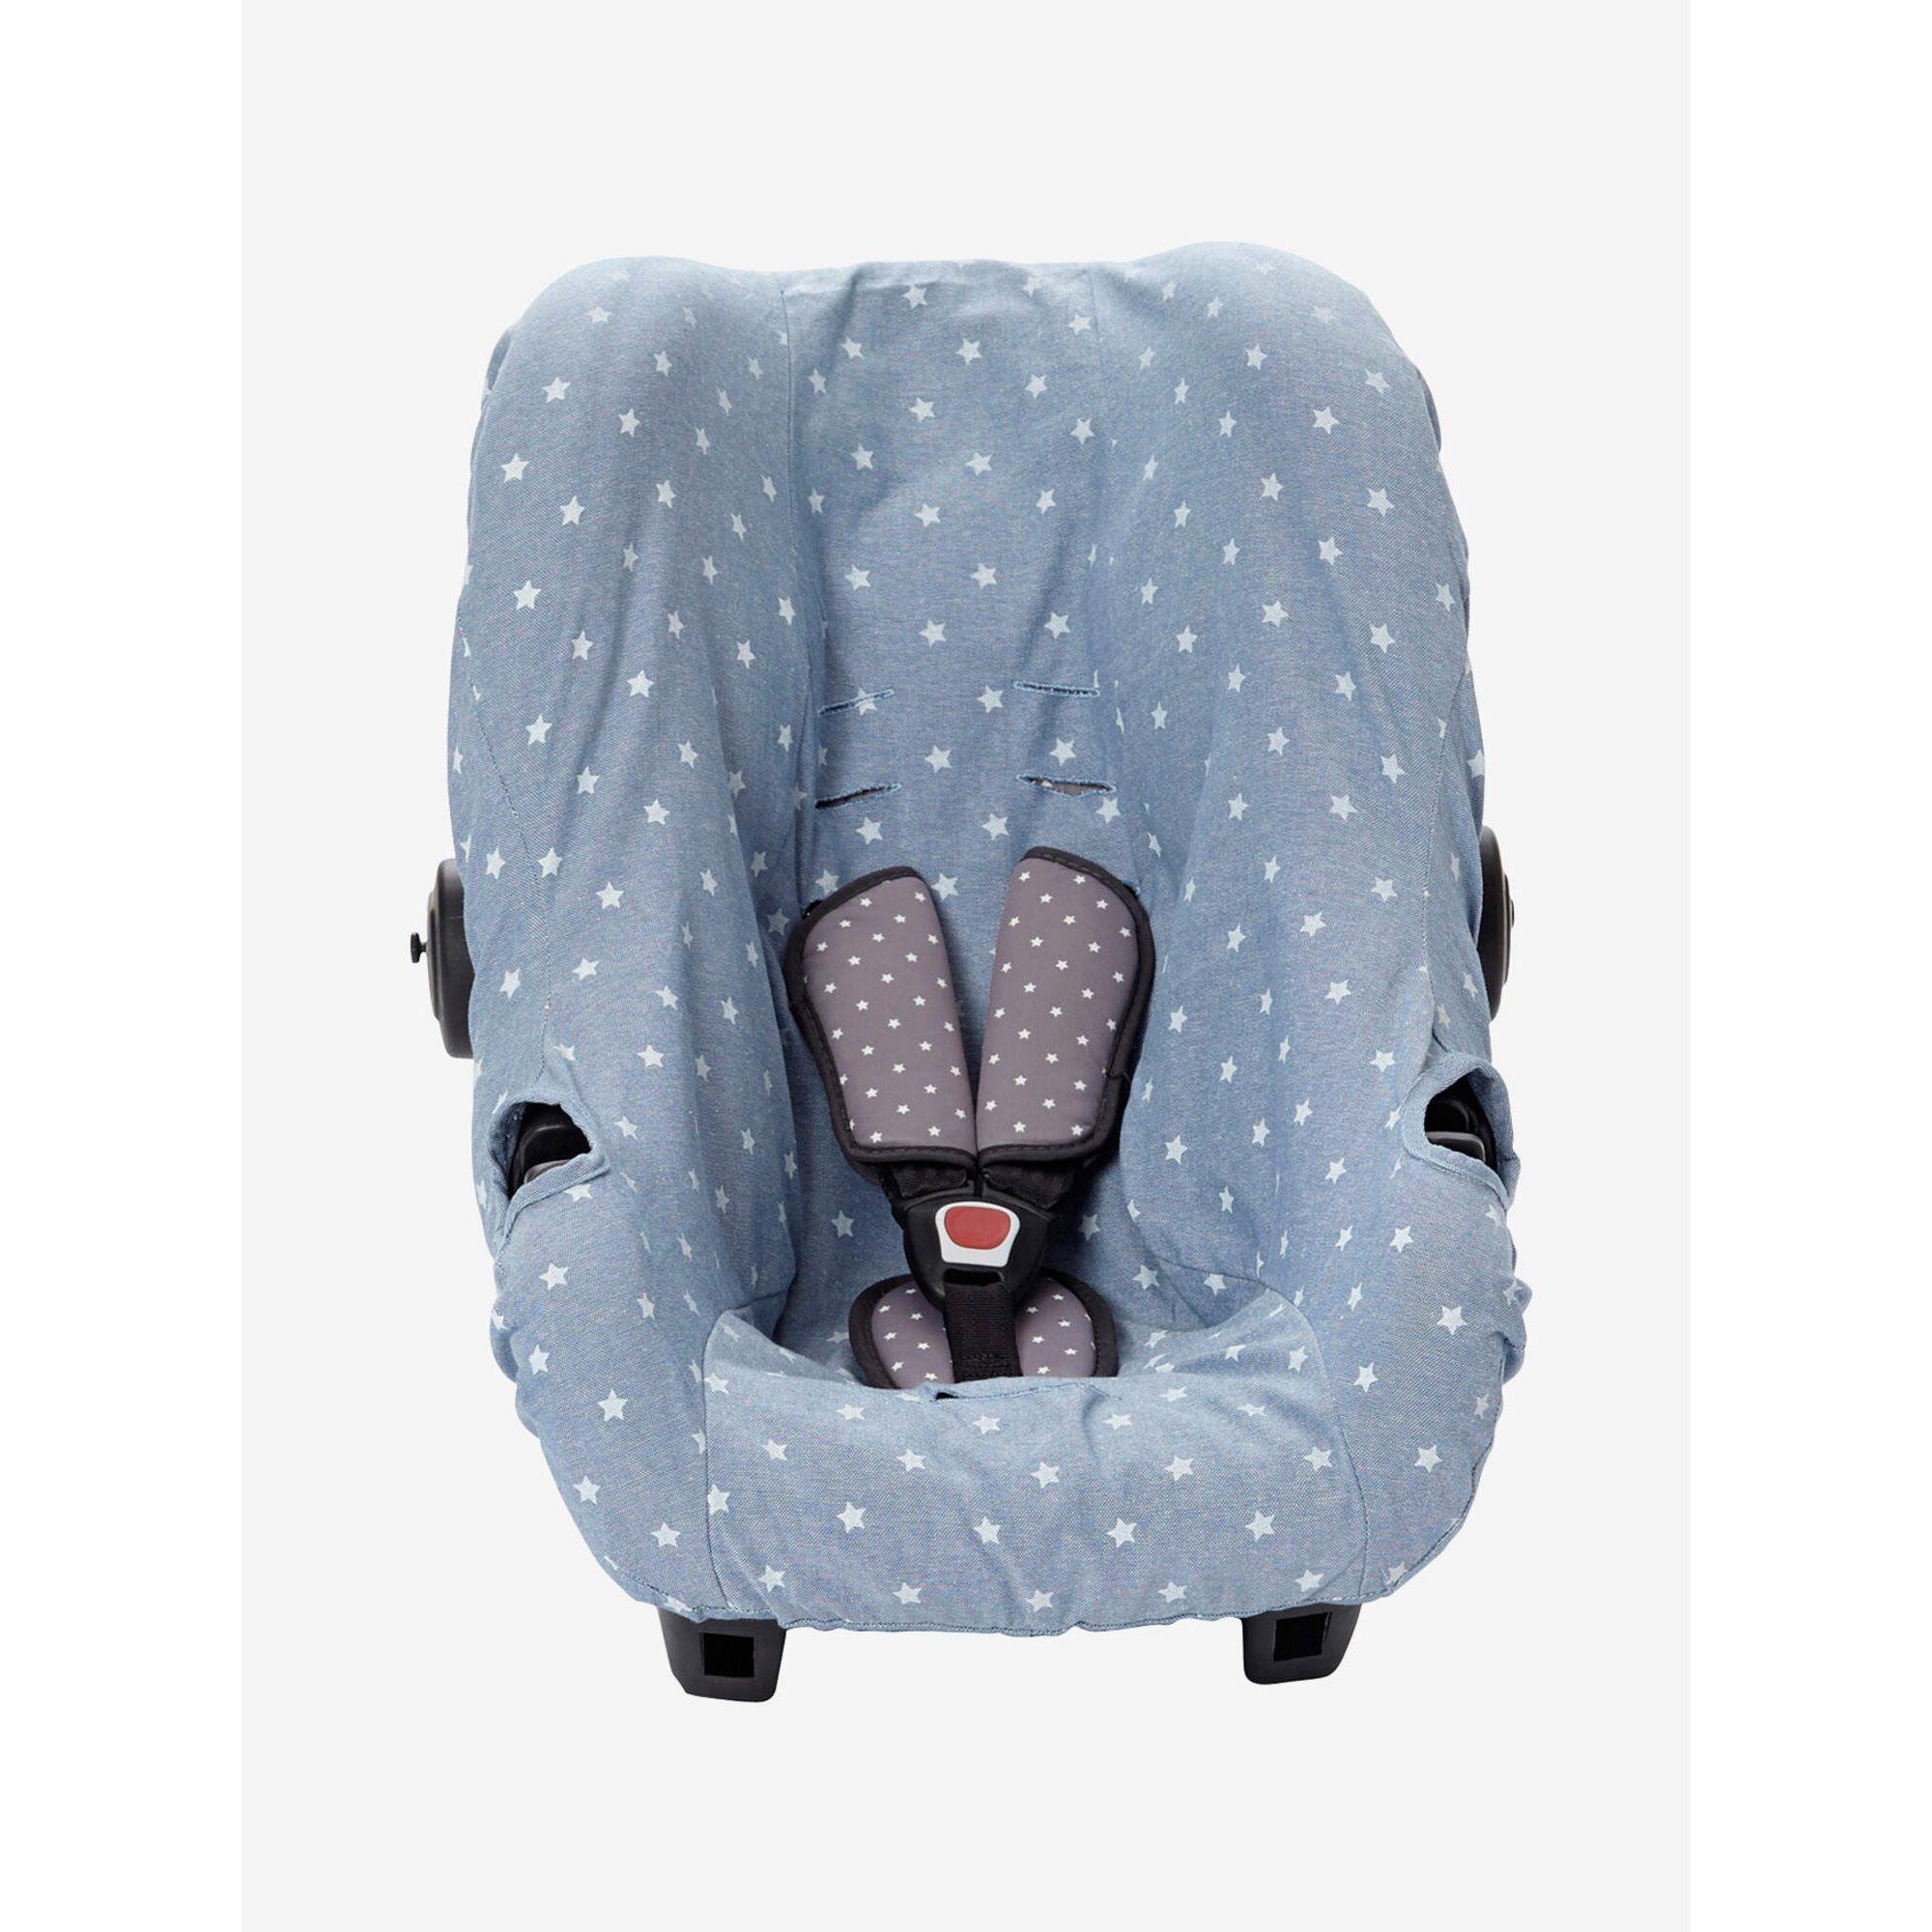 vertbaudet-schonbezug-fur-babyschale-gr-0-elastisch, 20.99 EUR @ babywalz-de